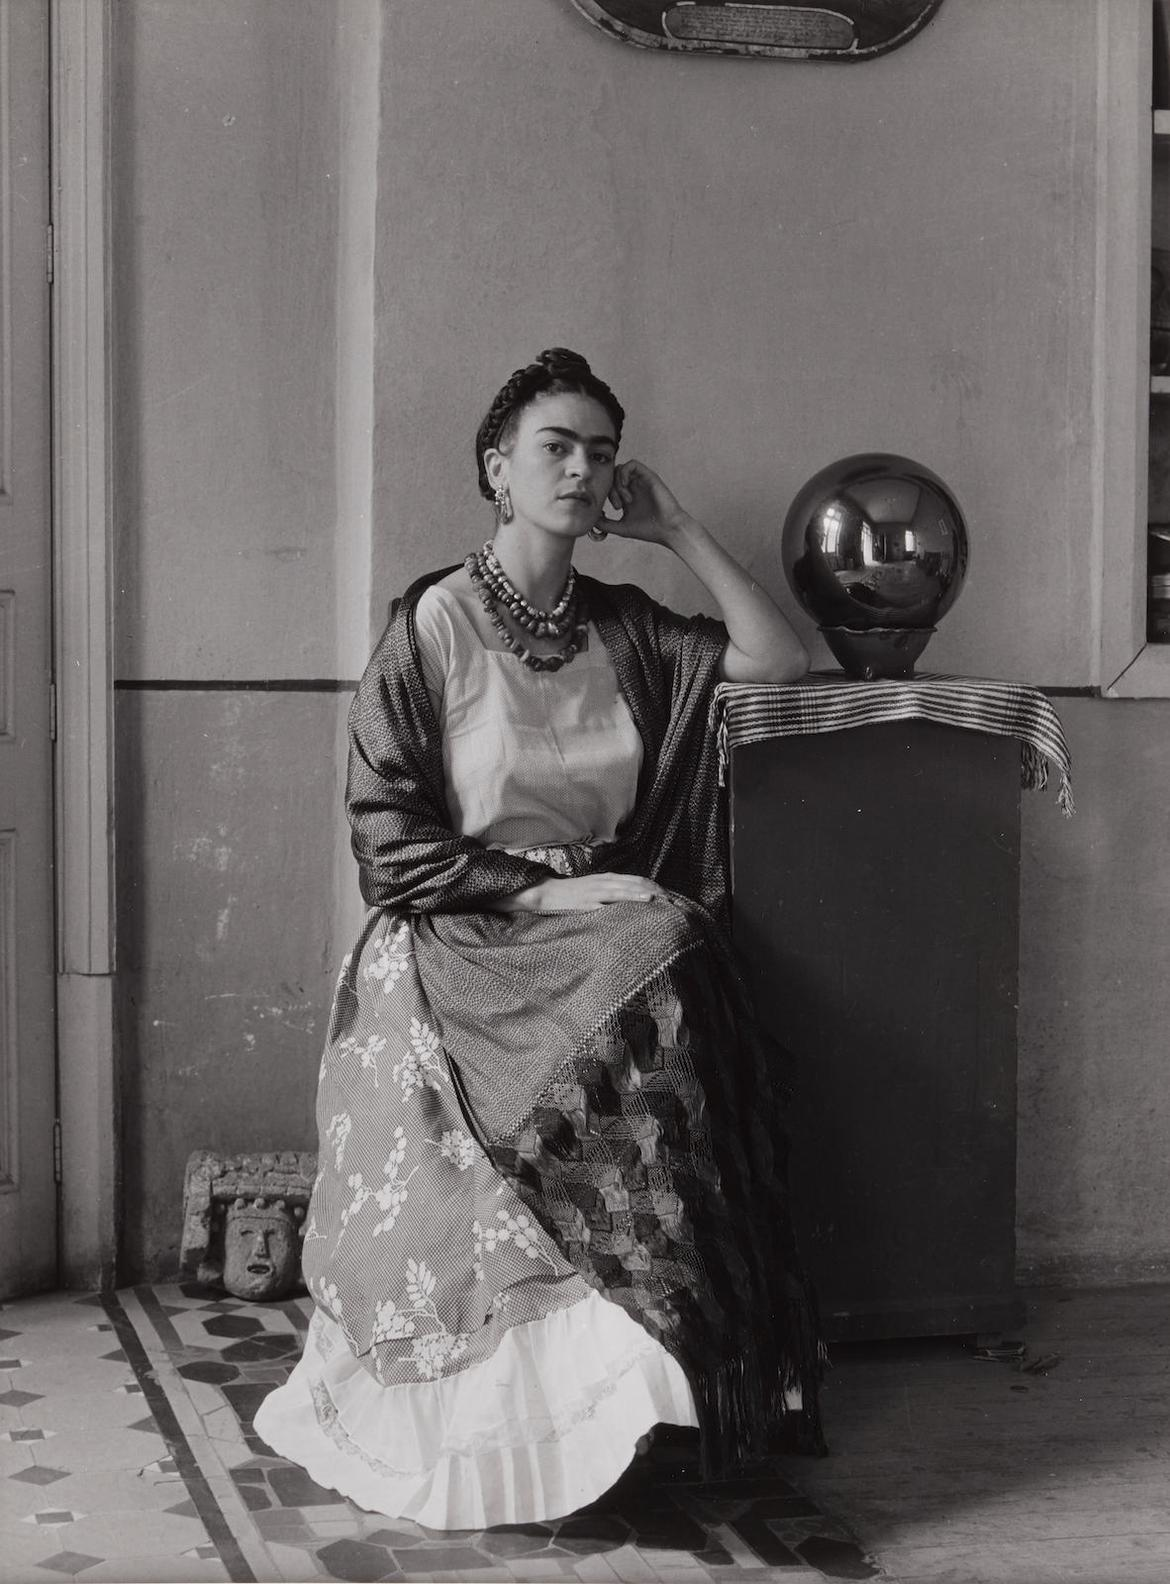 Manuel Alvarez Bravo-Frida Kahlo Con Globo, Coyoacan-1938